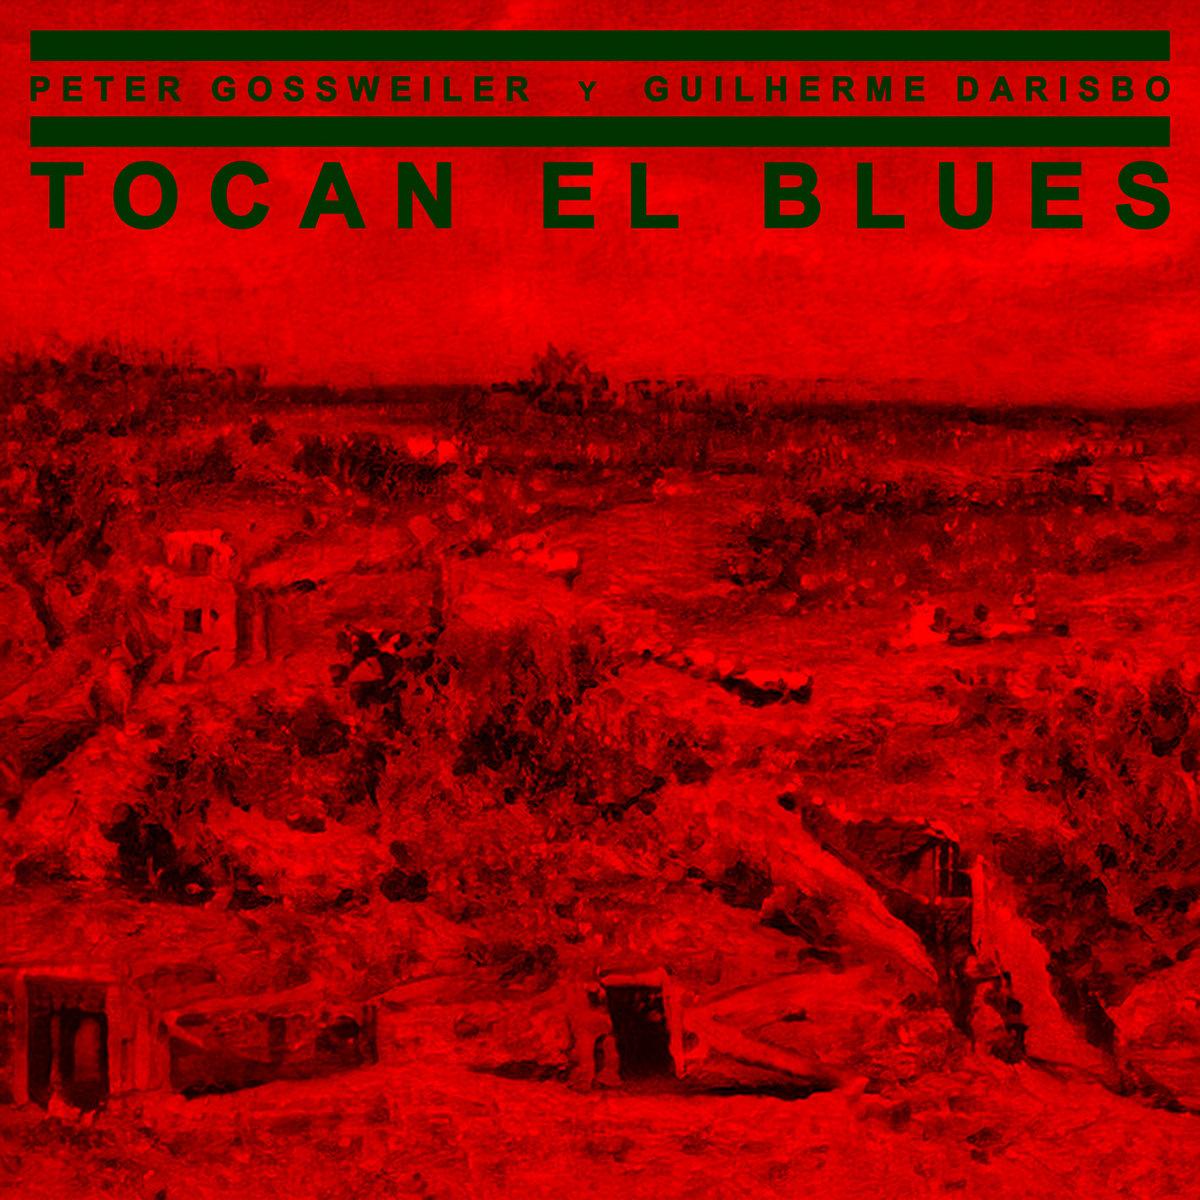 Guilherme Darisbo + Peter Gossweiler – Tocan el Blues